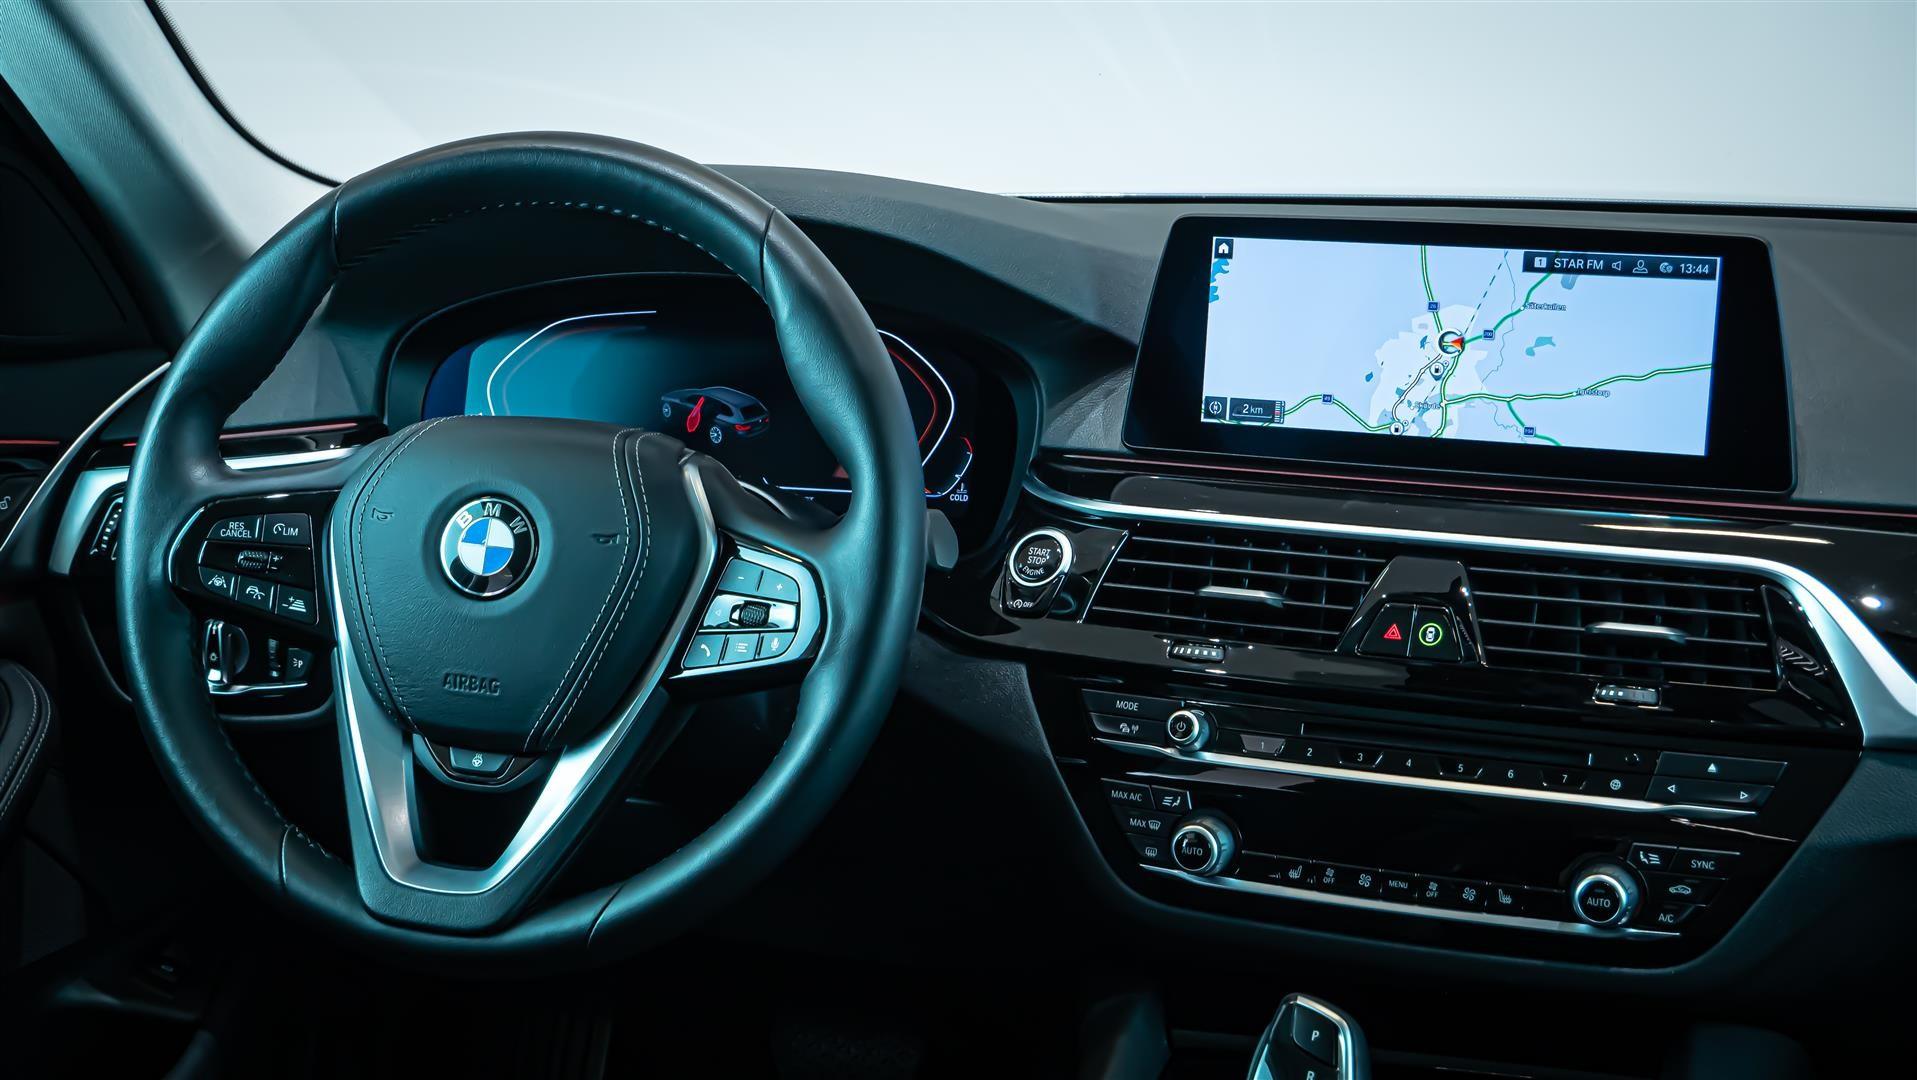 BMW 520d xDrive Touring Navi Värmare Driving Assistant Plus Drag_11